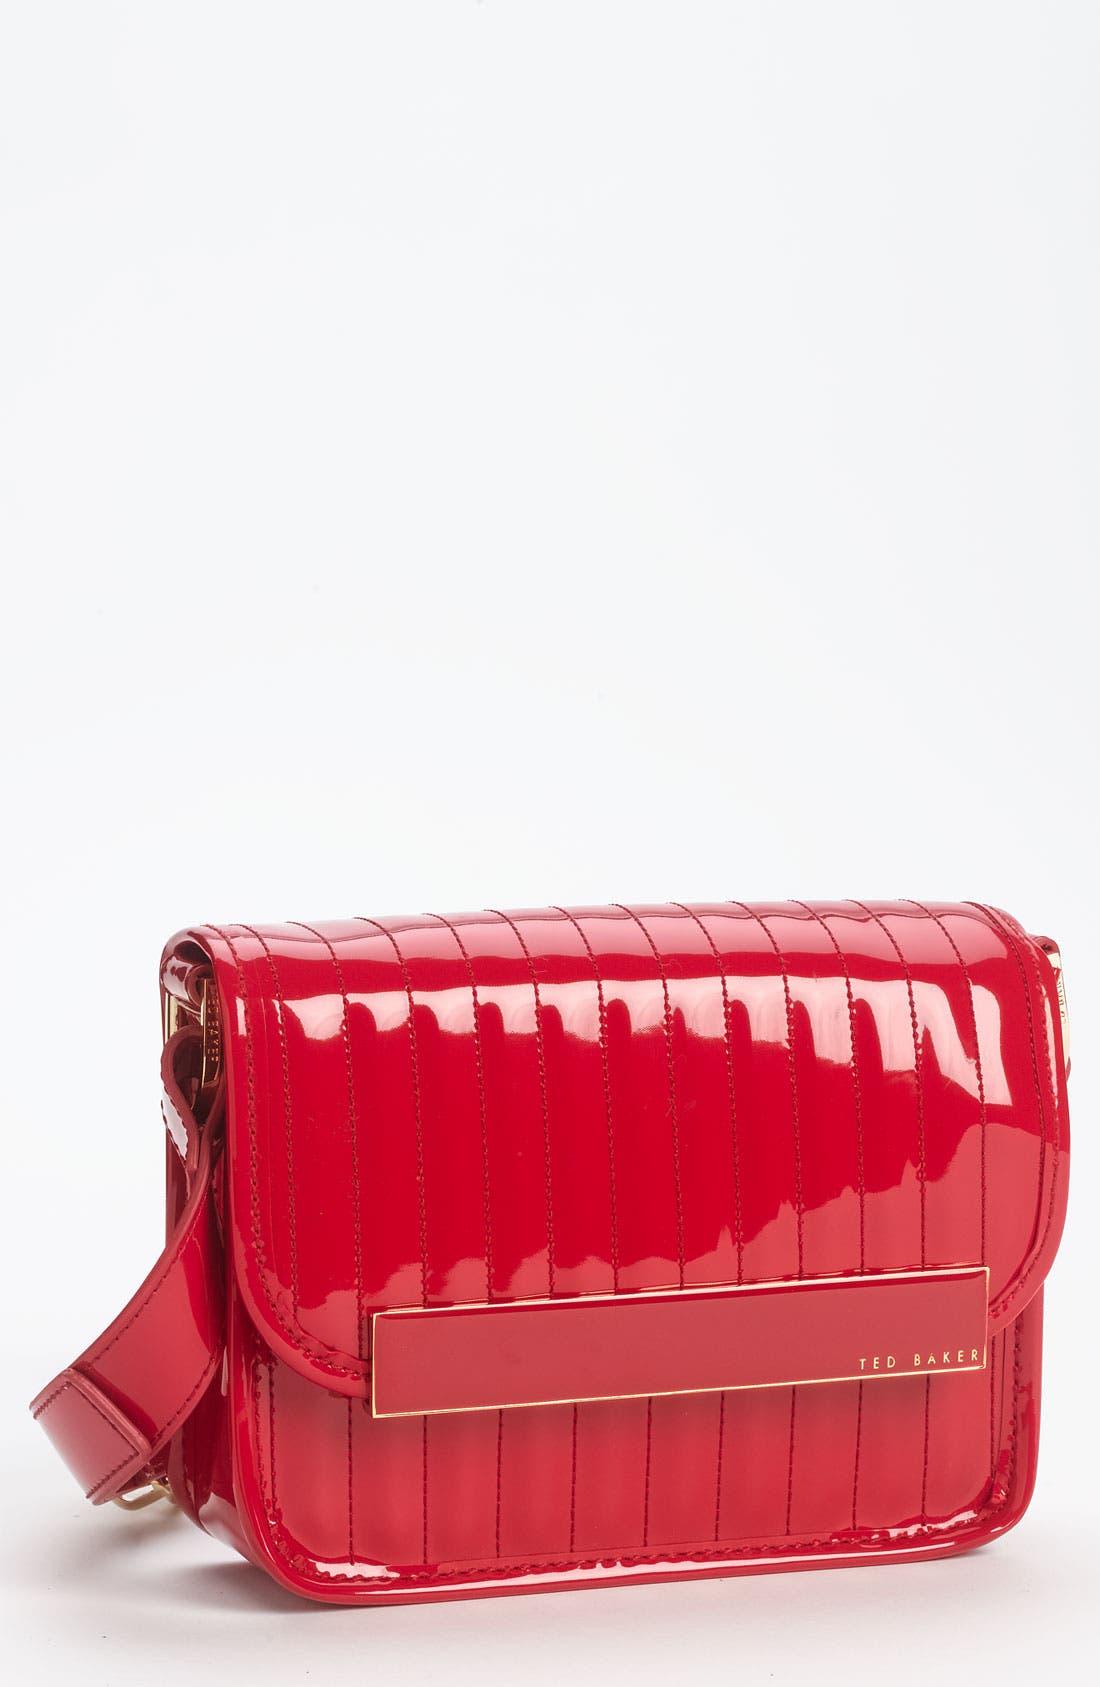 Alternate Image 1 Selected - Ted Baker London 'Small' Crossbody Bag